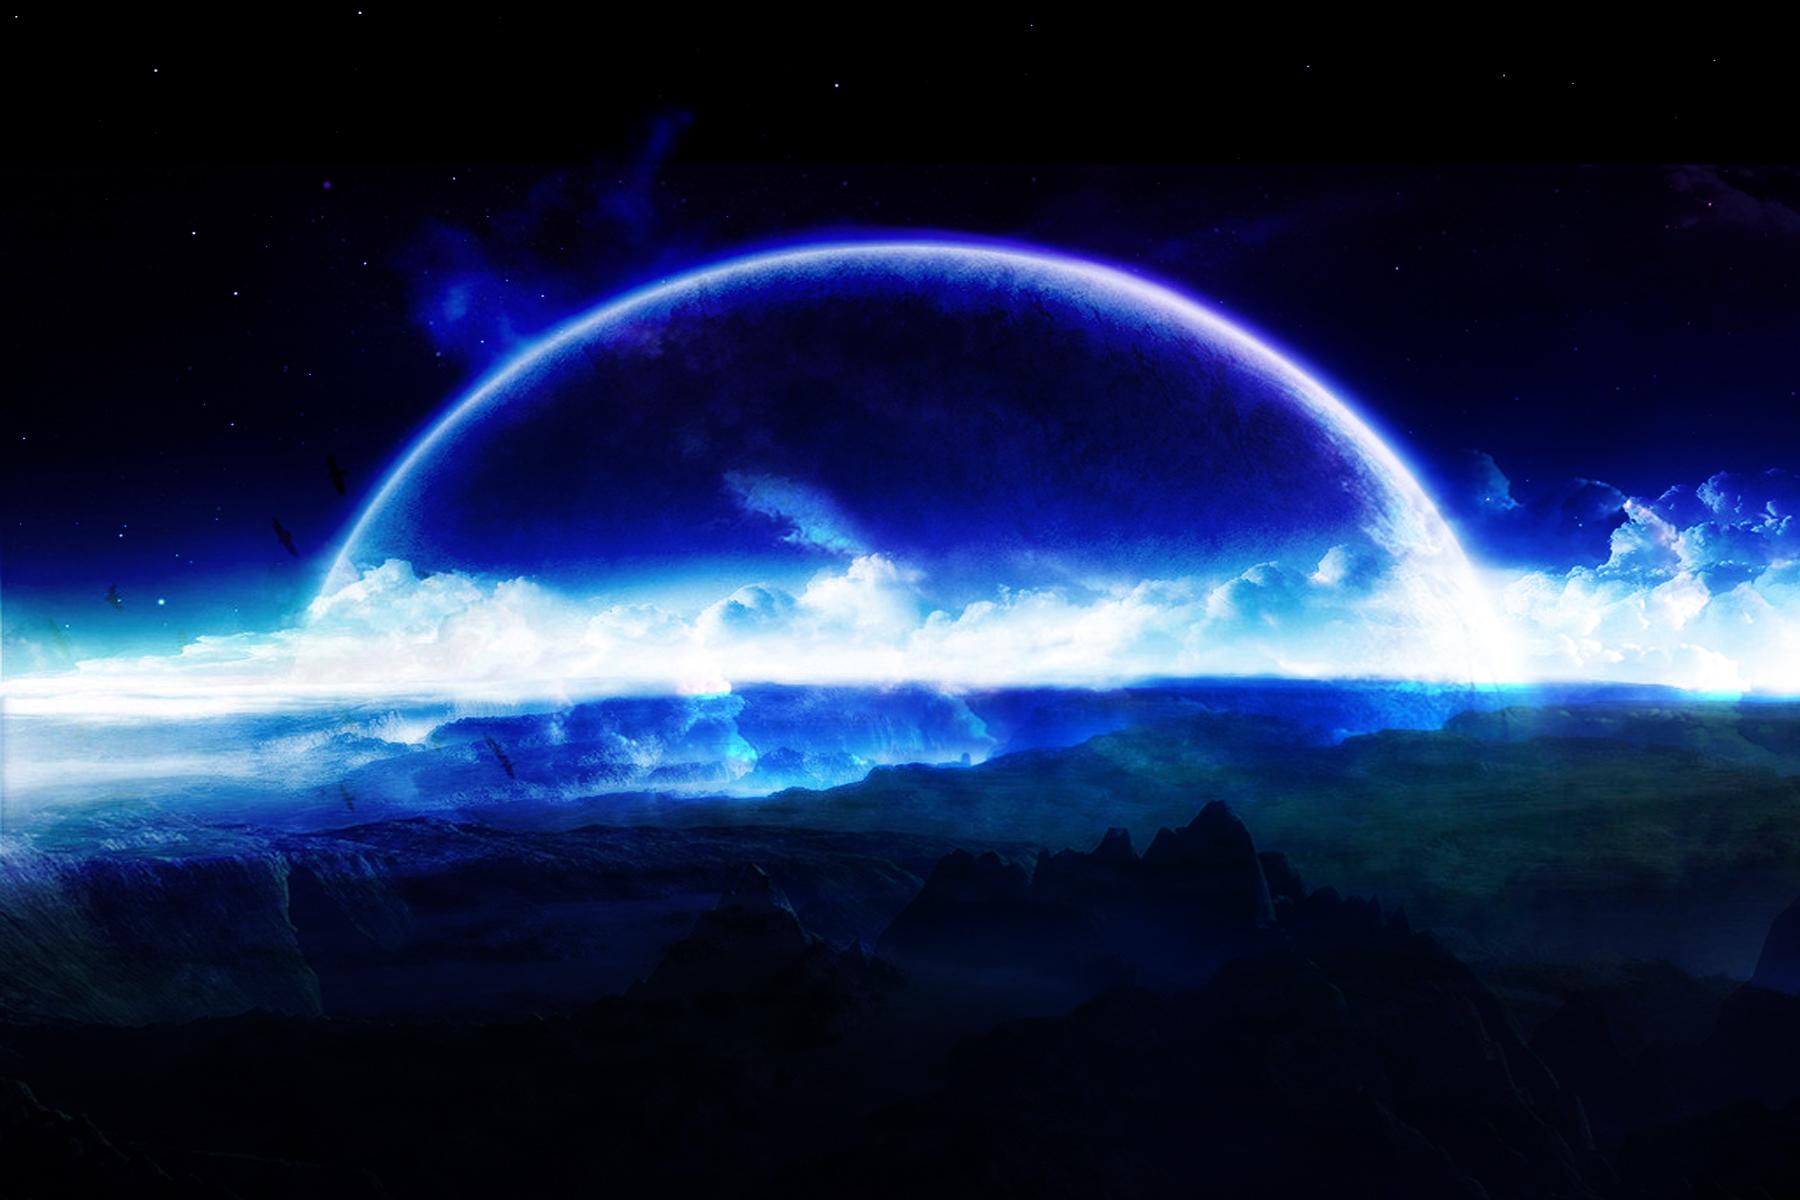 blue_sun_rise_by_xxneverbethesamexx-d38b5iy